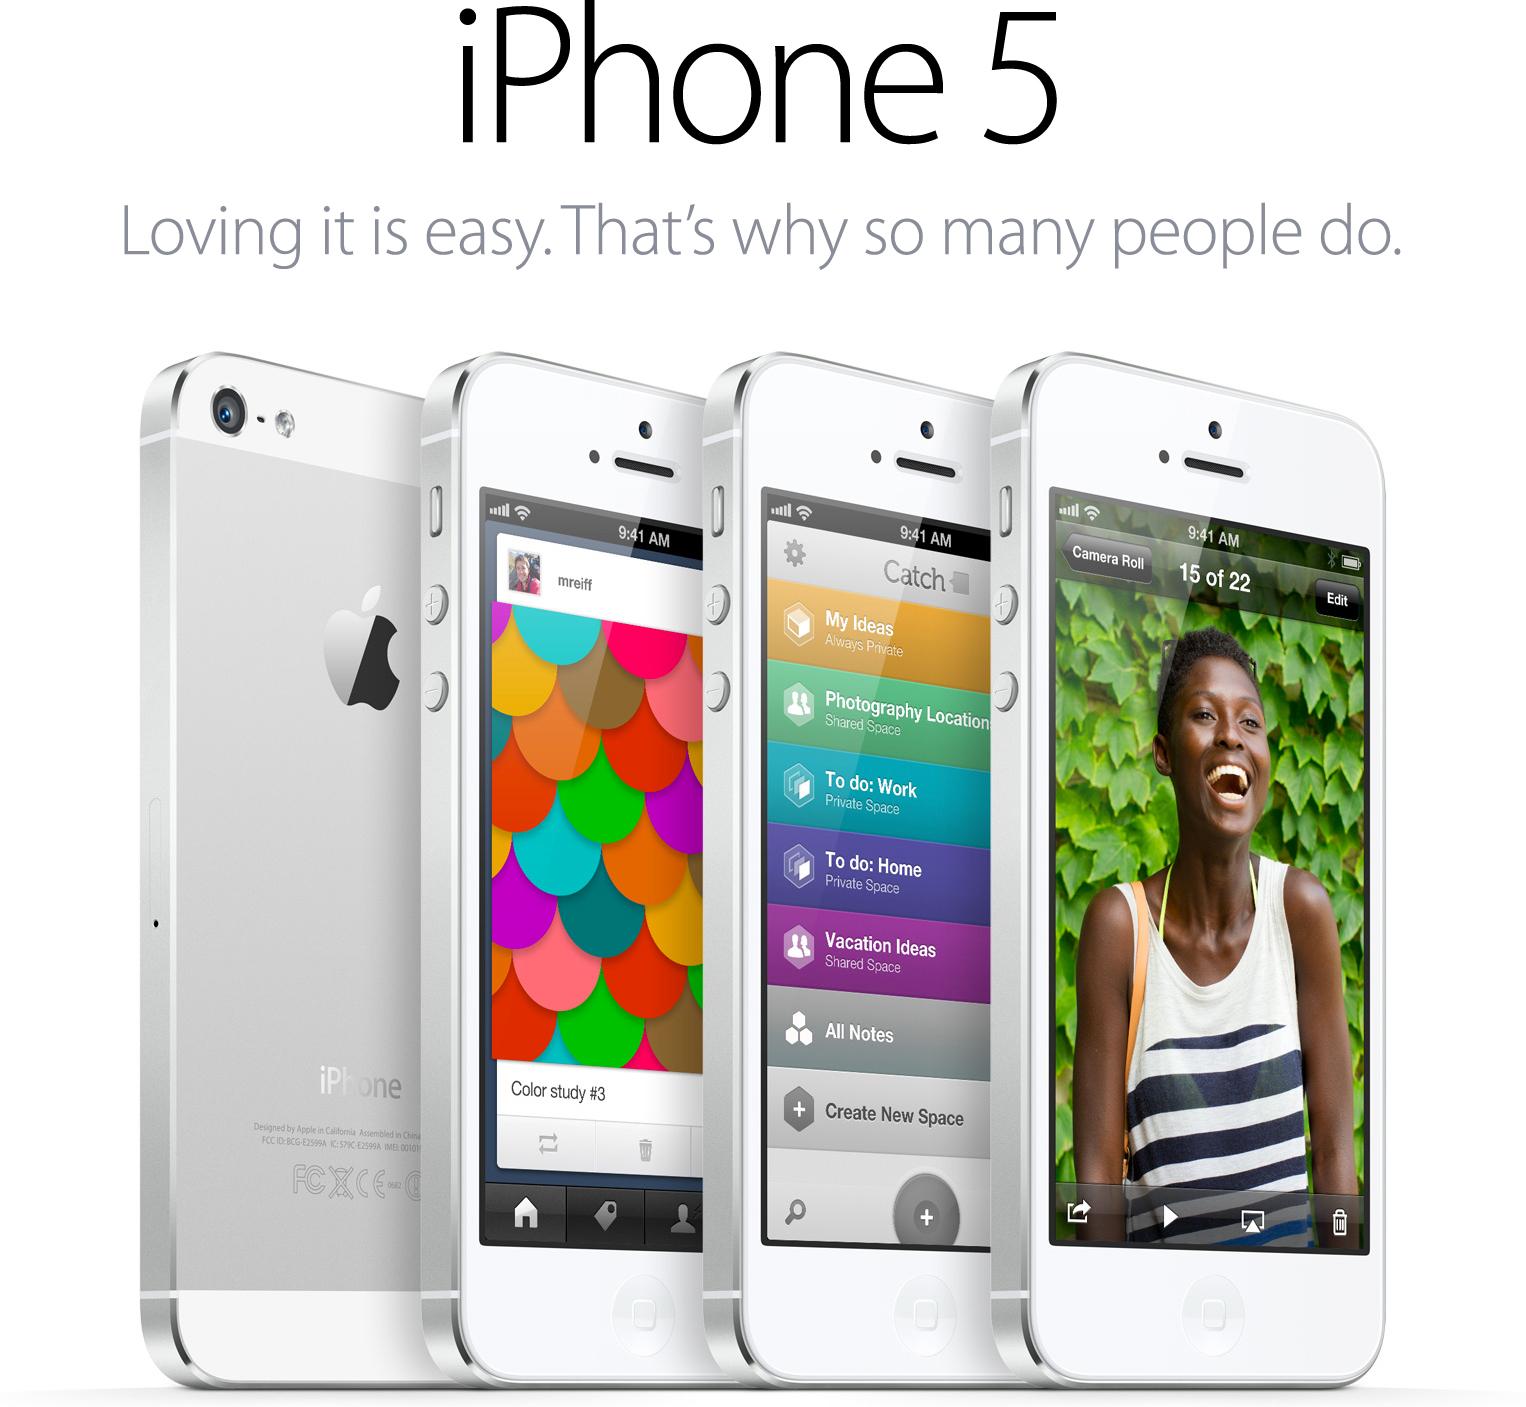 Novo slogan do iPhone 5